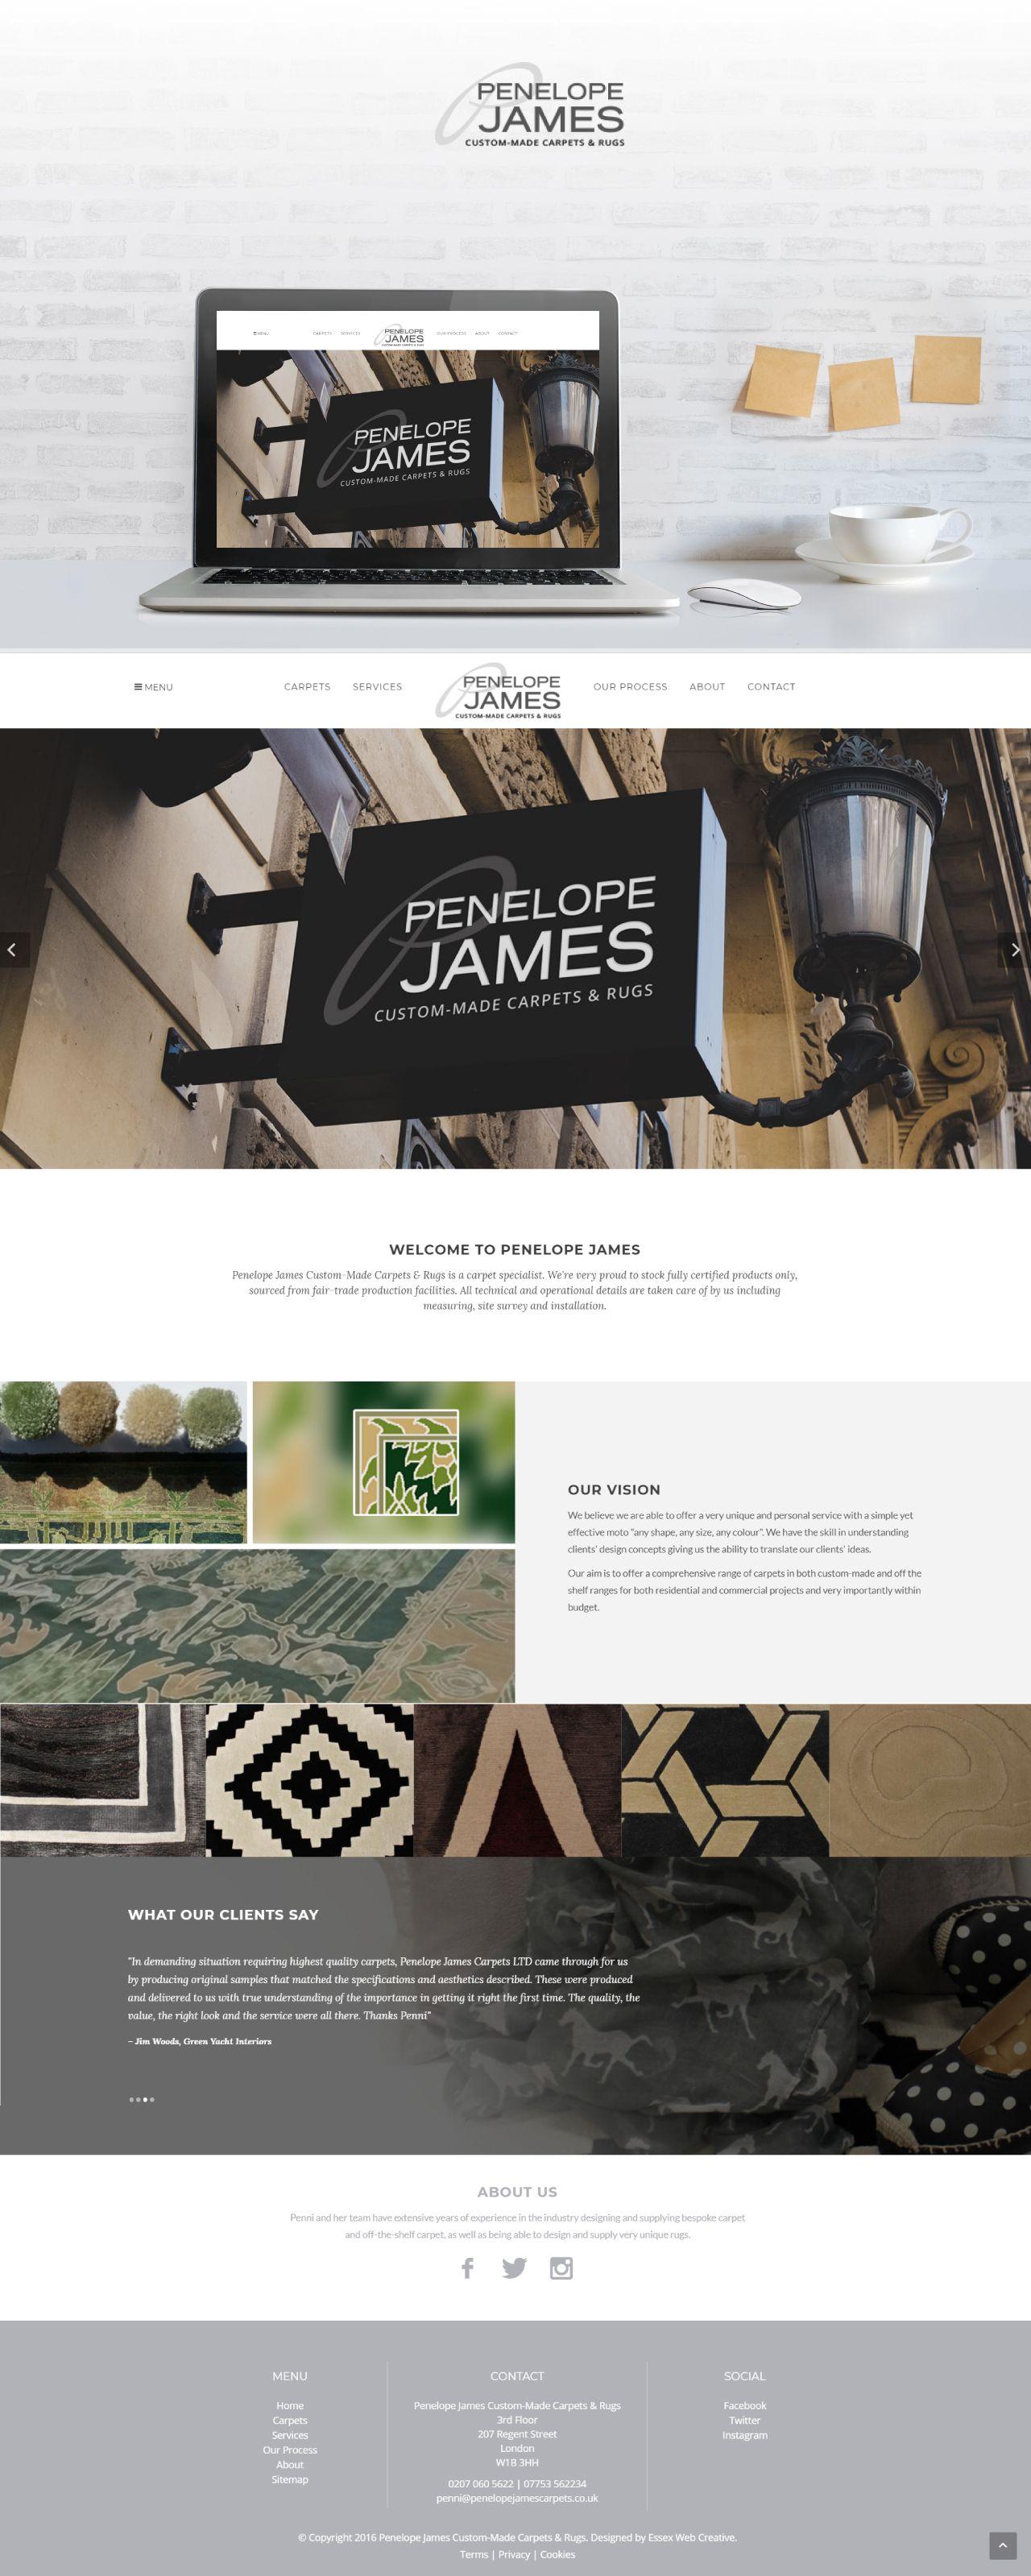 E Shop Ecommerce Web Design Company Search Engine Optimization